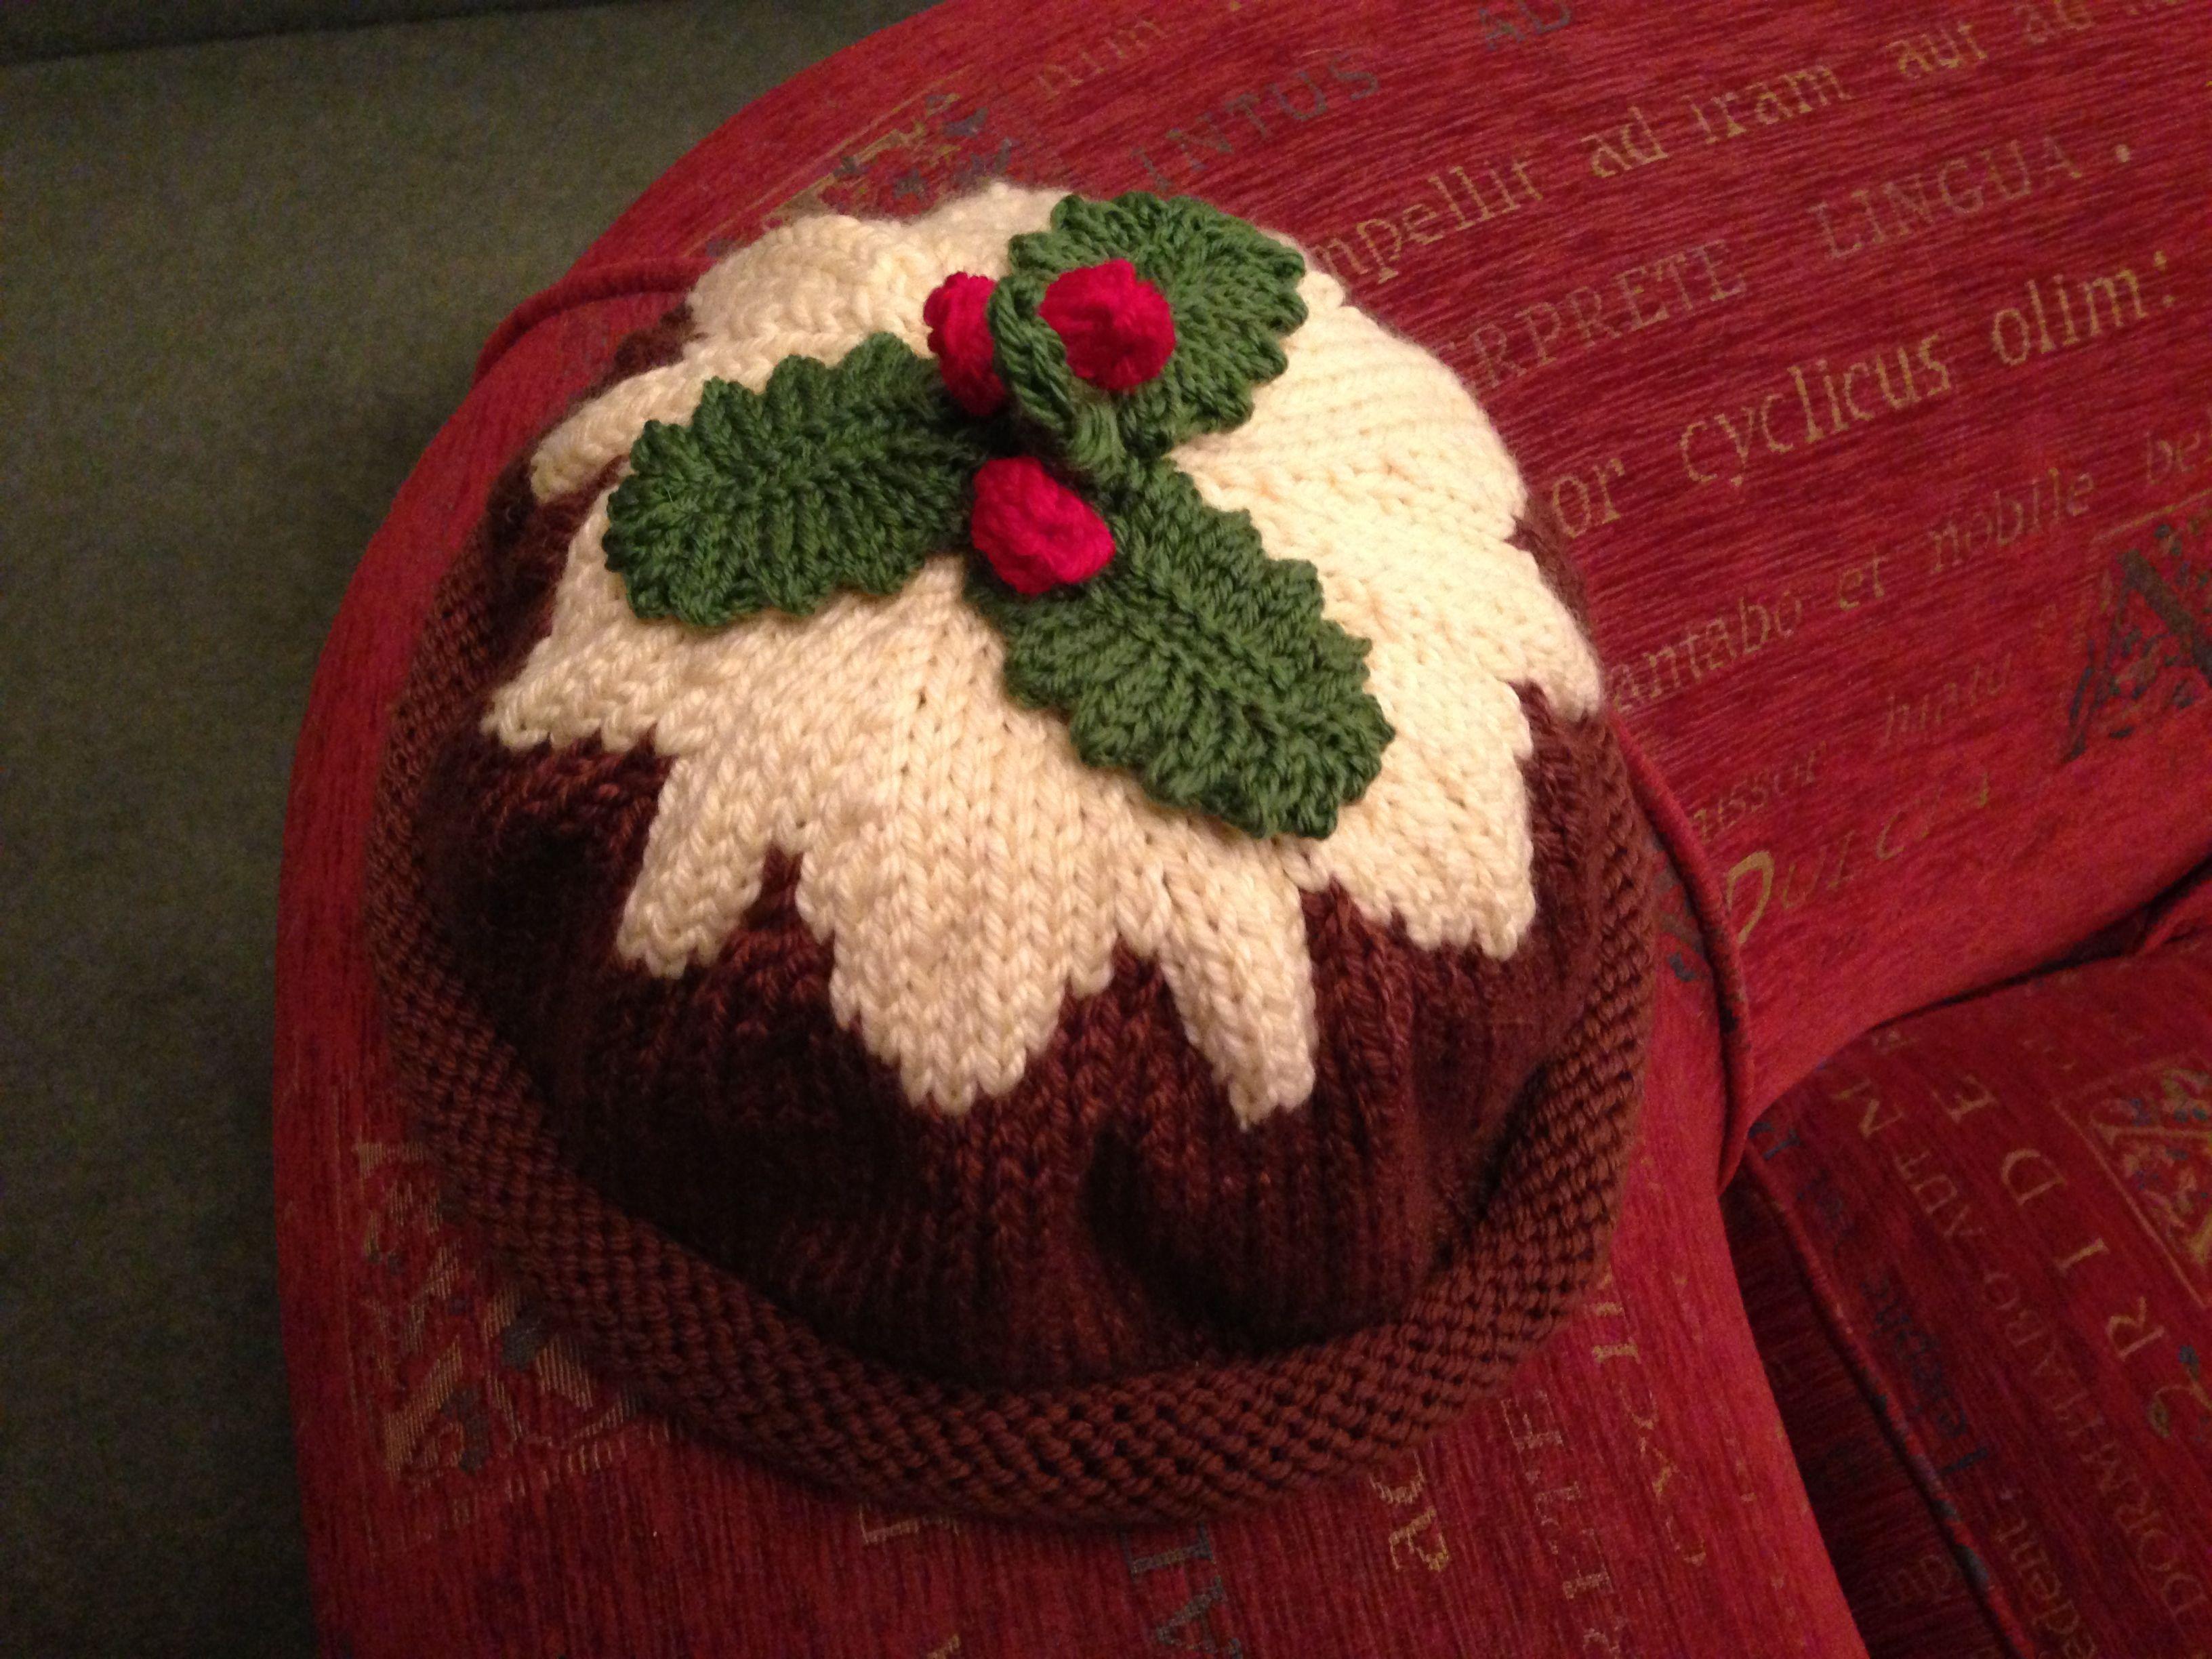 Knitting Pattern Xmas Pudding Hat : Christmas Pudding Hat My Knitting Pinterest Christmas Pudding, Puddings...